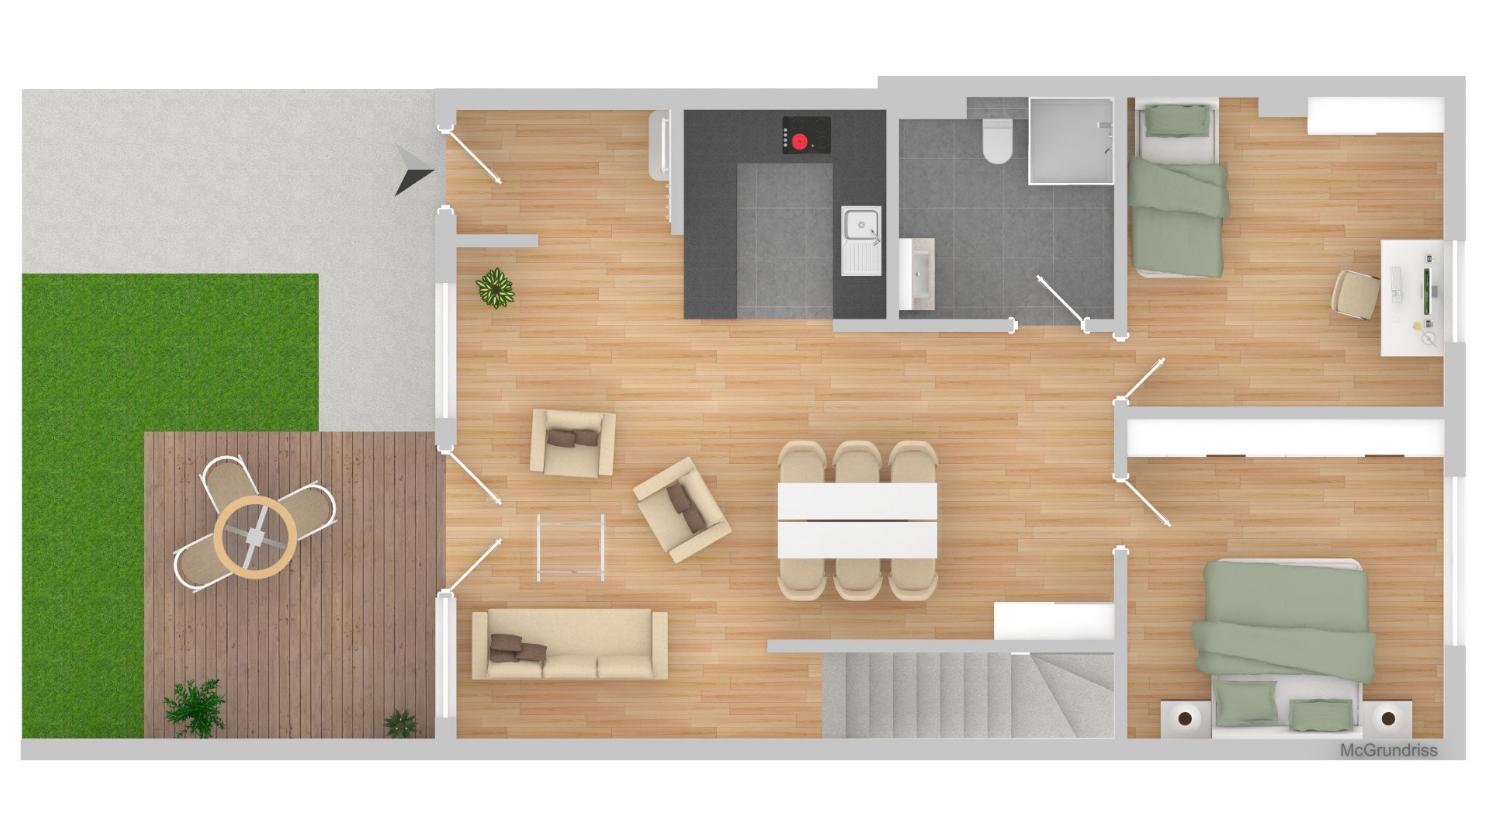 Heinemann Immobilien & Bauprojekte, Haan, Dürerstraße, Wohnung 2, Erdgeschoss